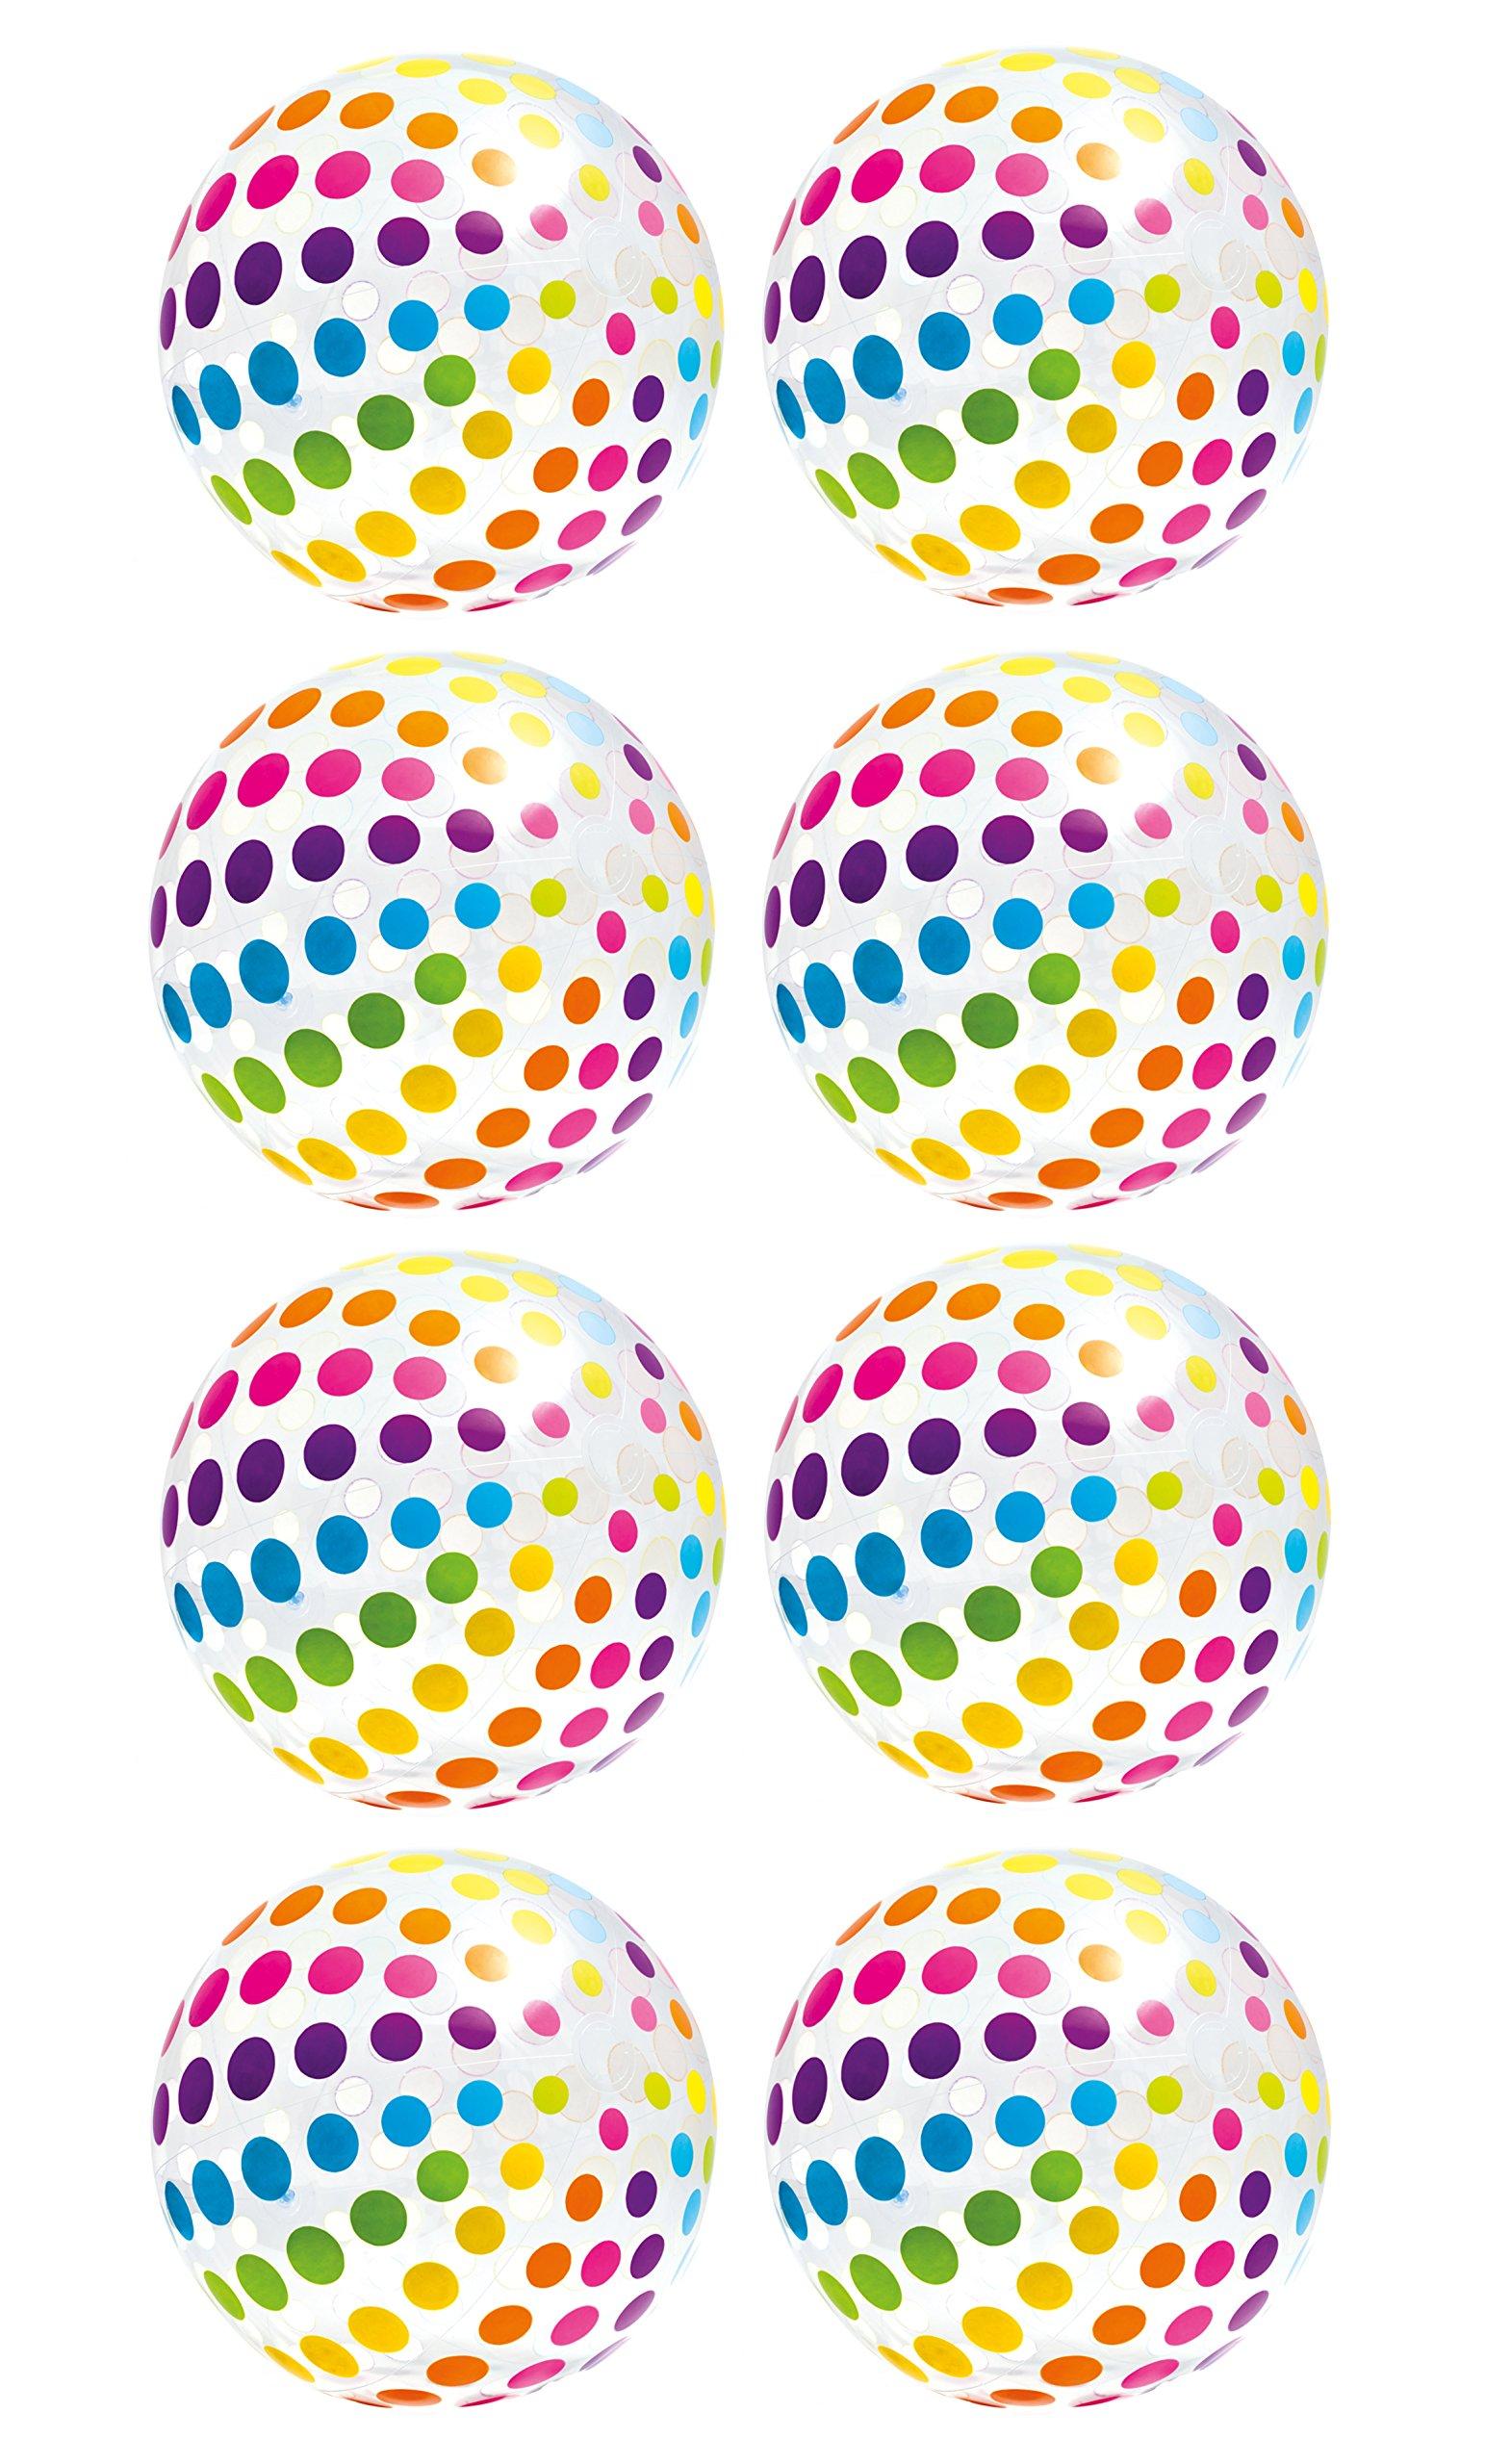 Intex Jumbo Inflatable Big Panel Colorful Polka Dot Giant Beach Balls (Set of 8)